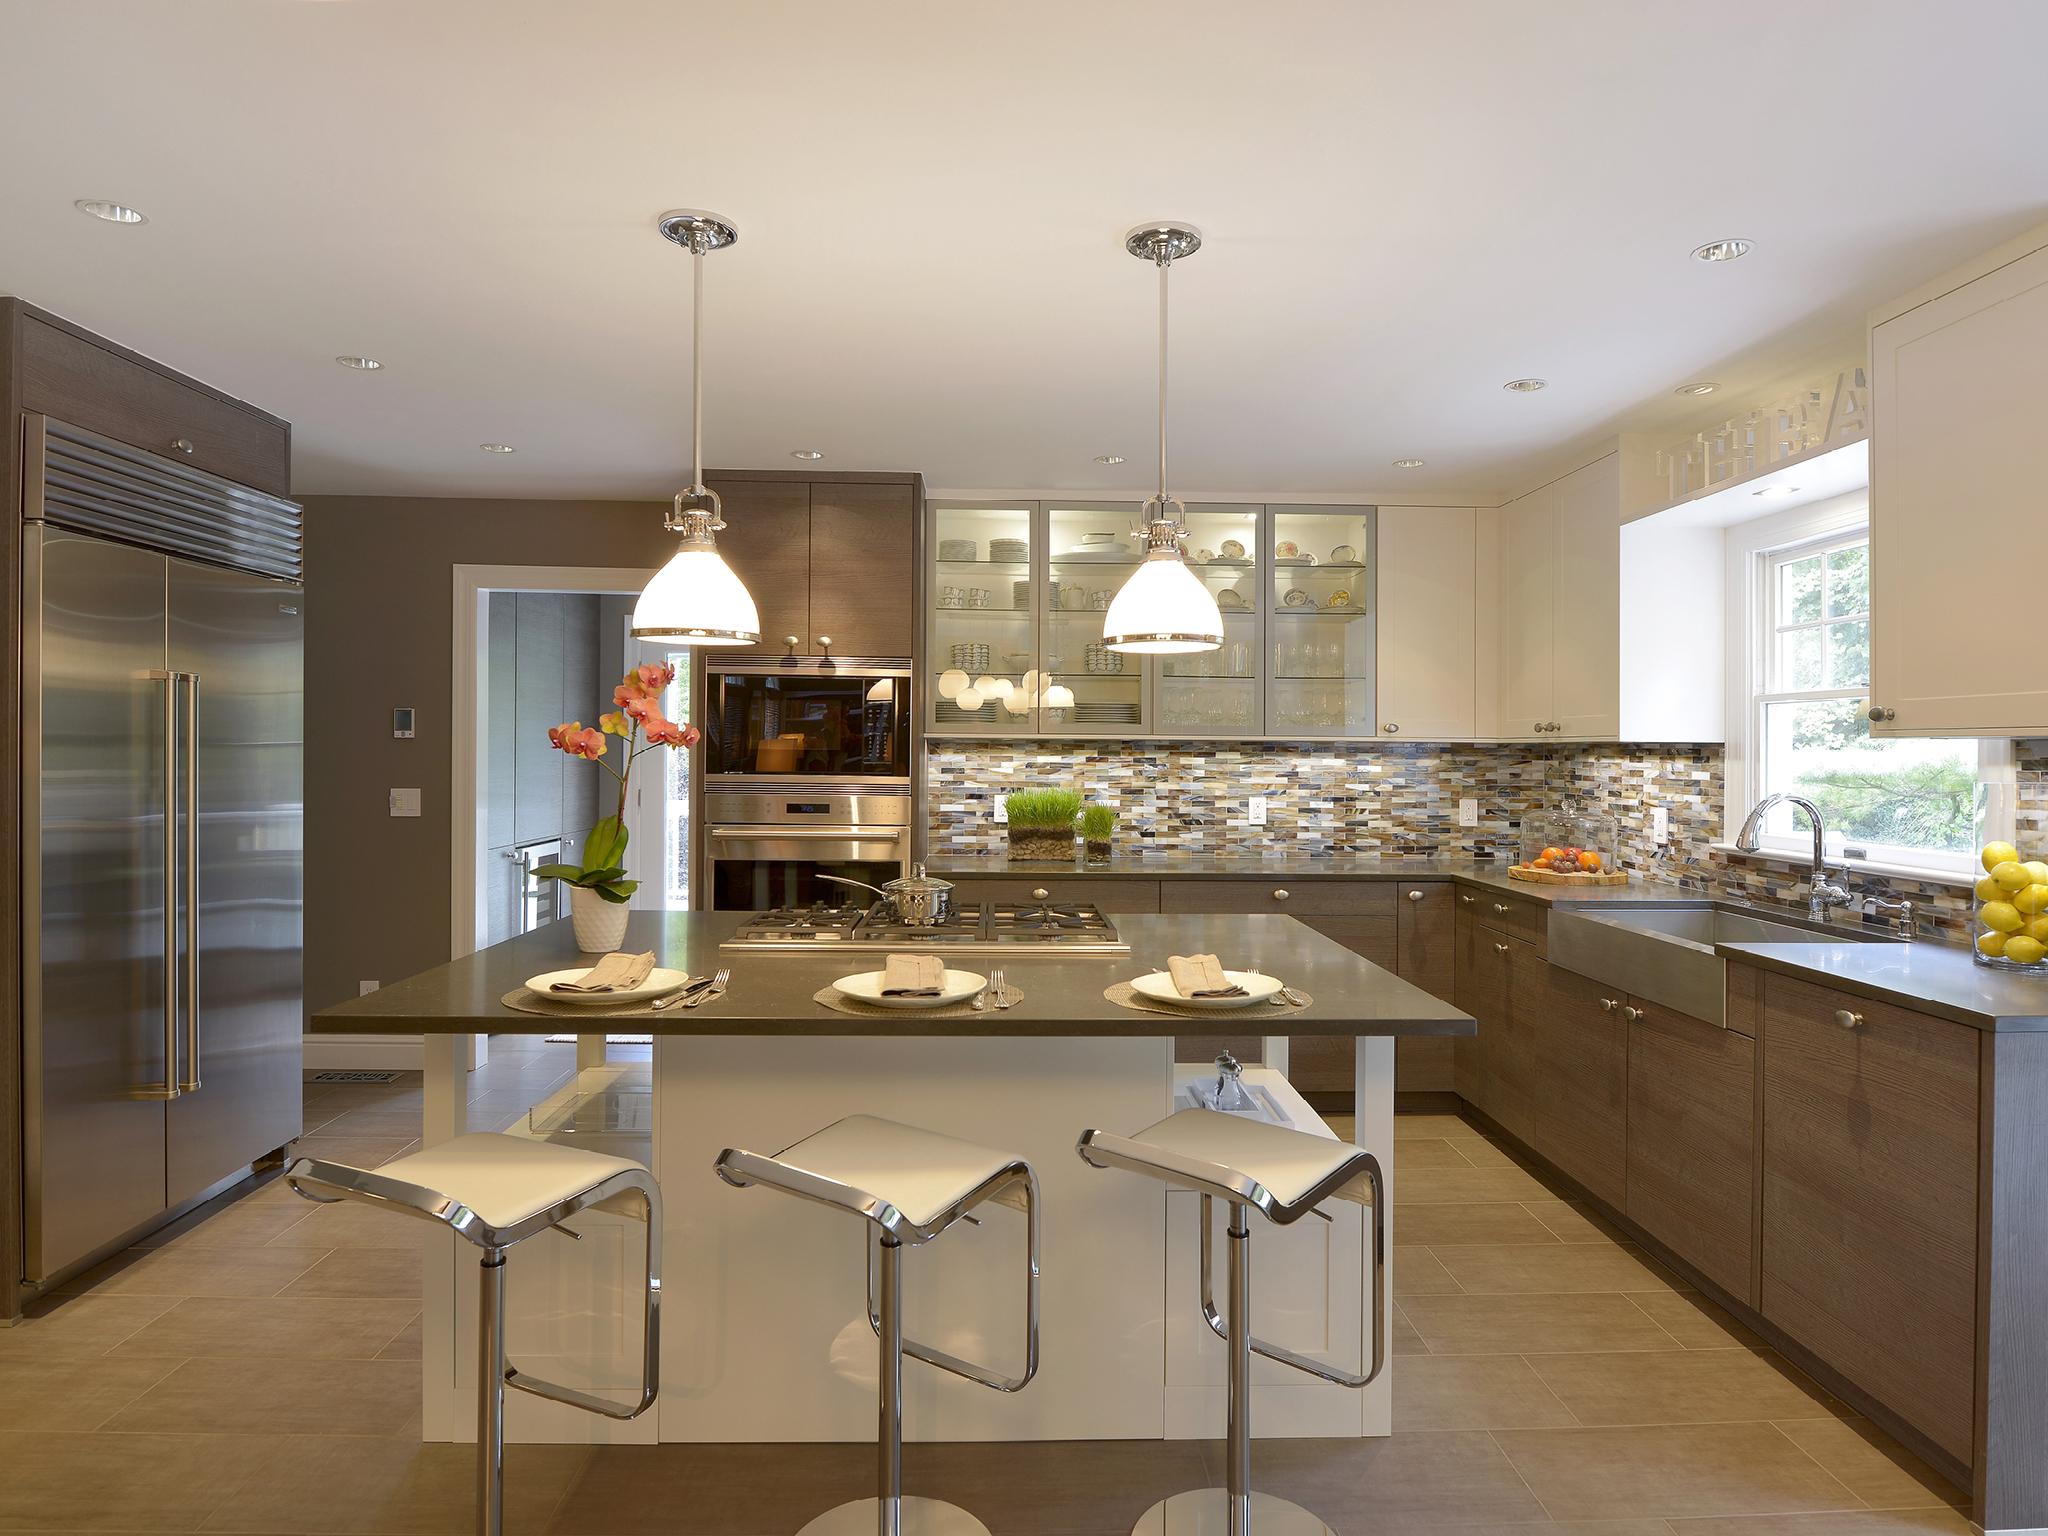 Cucina Modern Renovation Kitchen Full